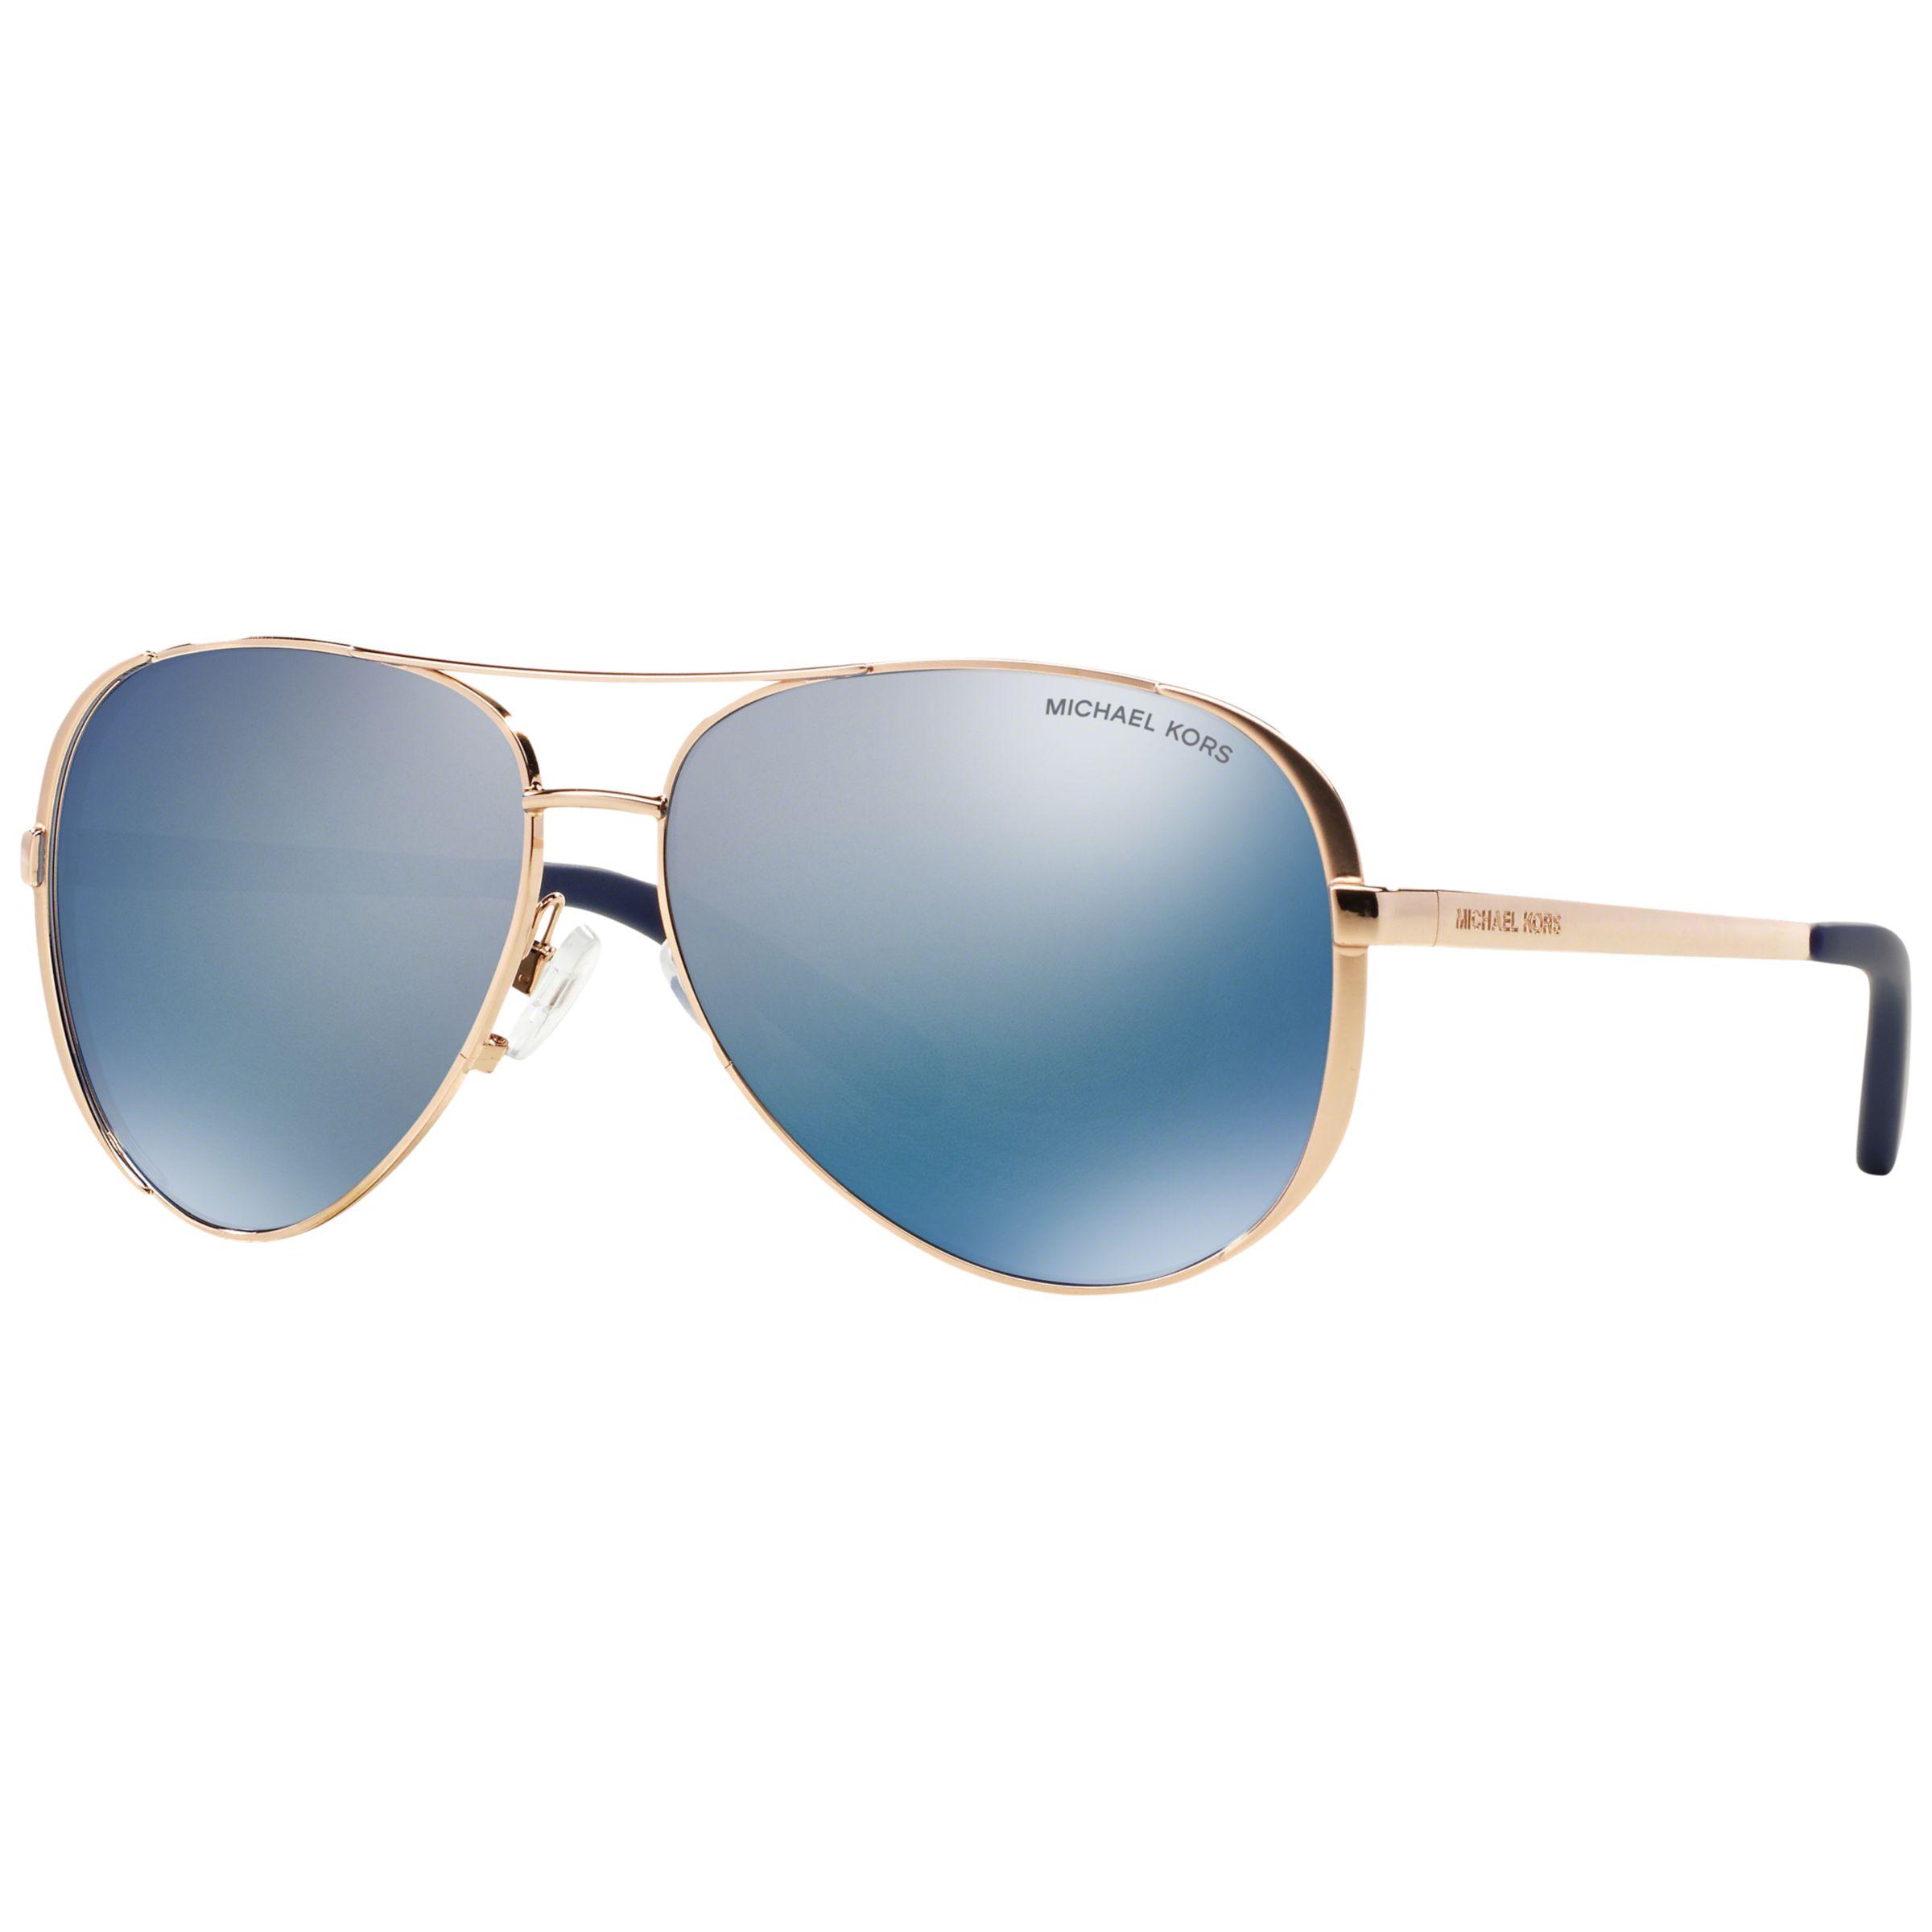 348d1ffedc6 Michael Kors MK5004 Chelsea Polarised Aviator Sunglasses at John Lewis    Partners